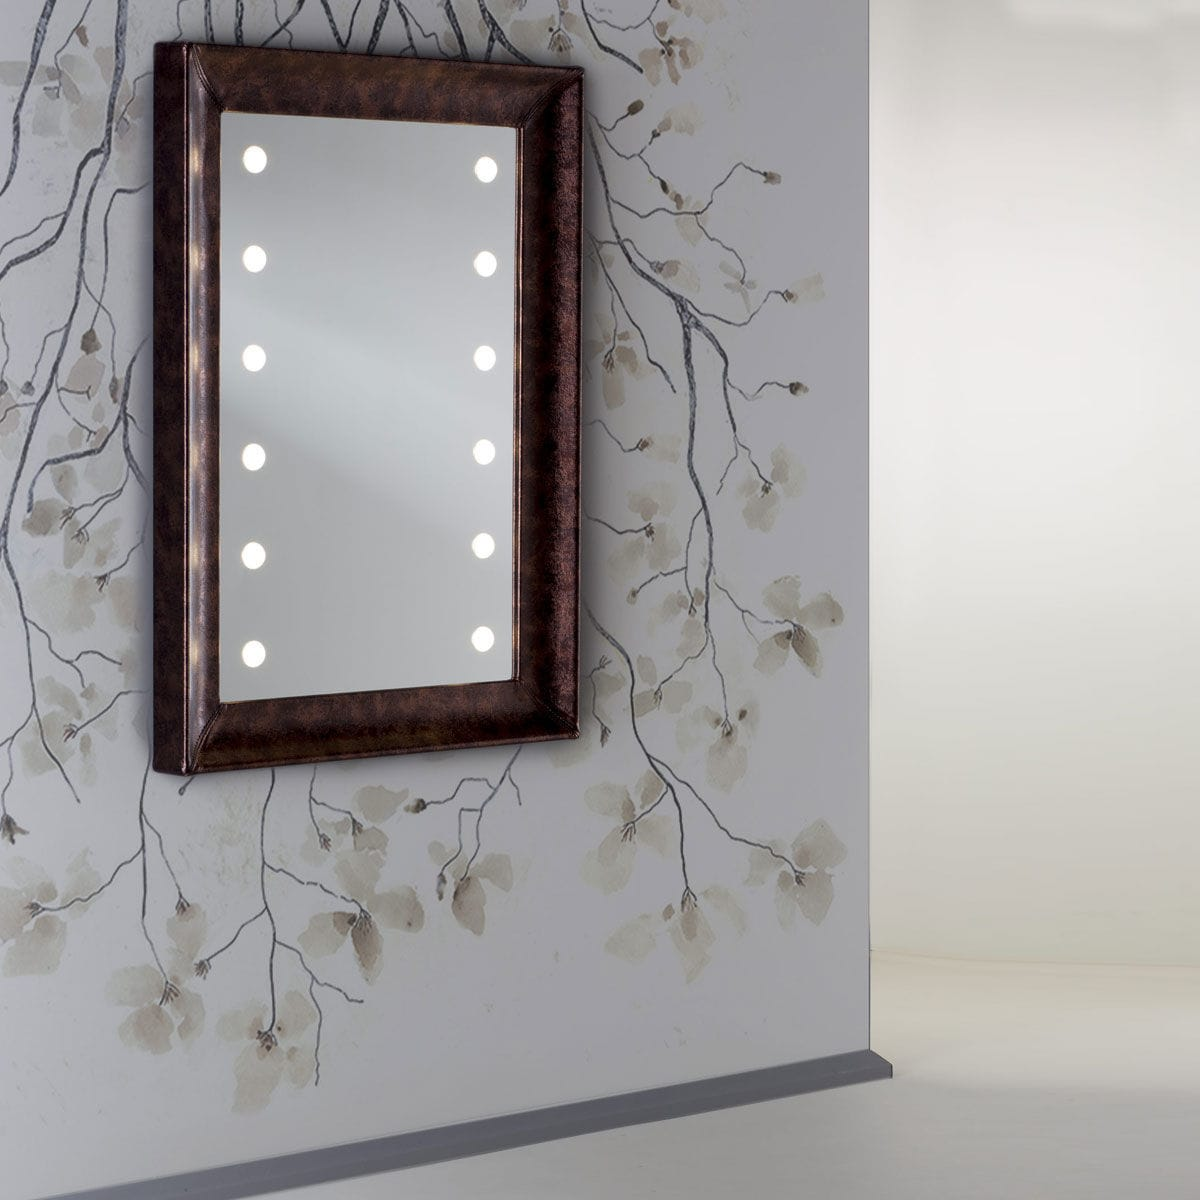 Wall-mounted mirror / illuminated / living room / bedroom - MF 365A ...